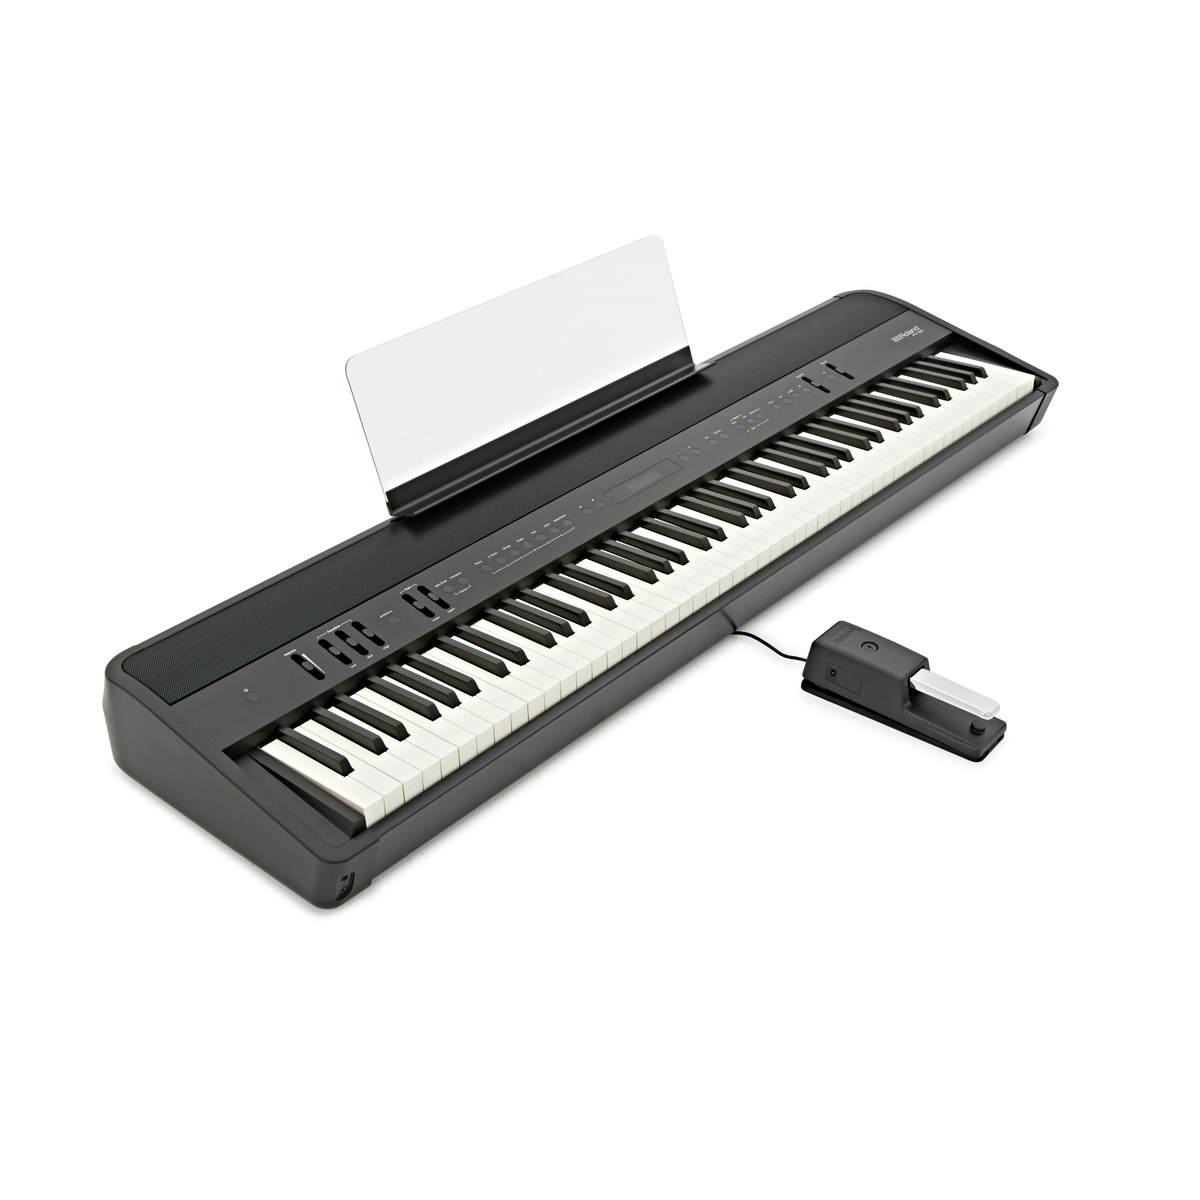 roland fp 90 digital piano black at gear4music. Black Bedroom Furniture Sets. Home Design Ideas